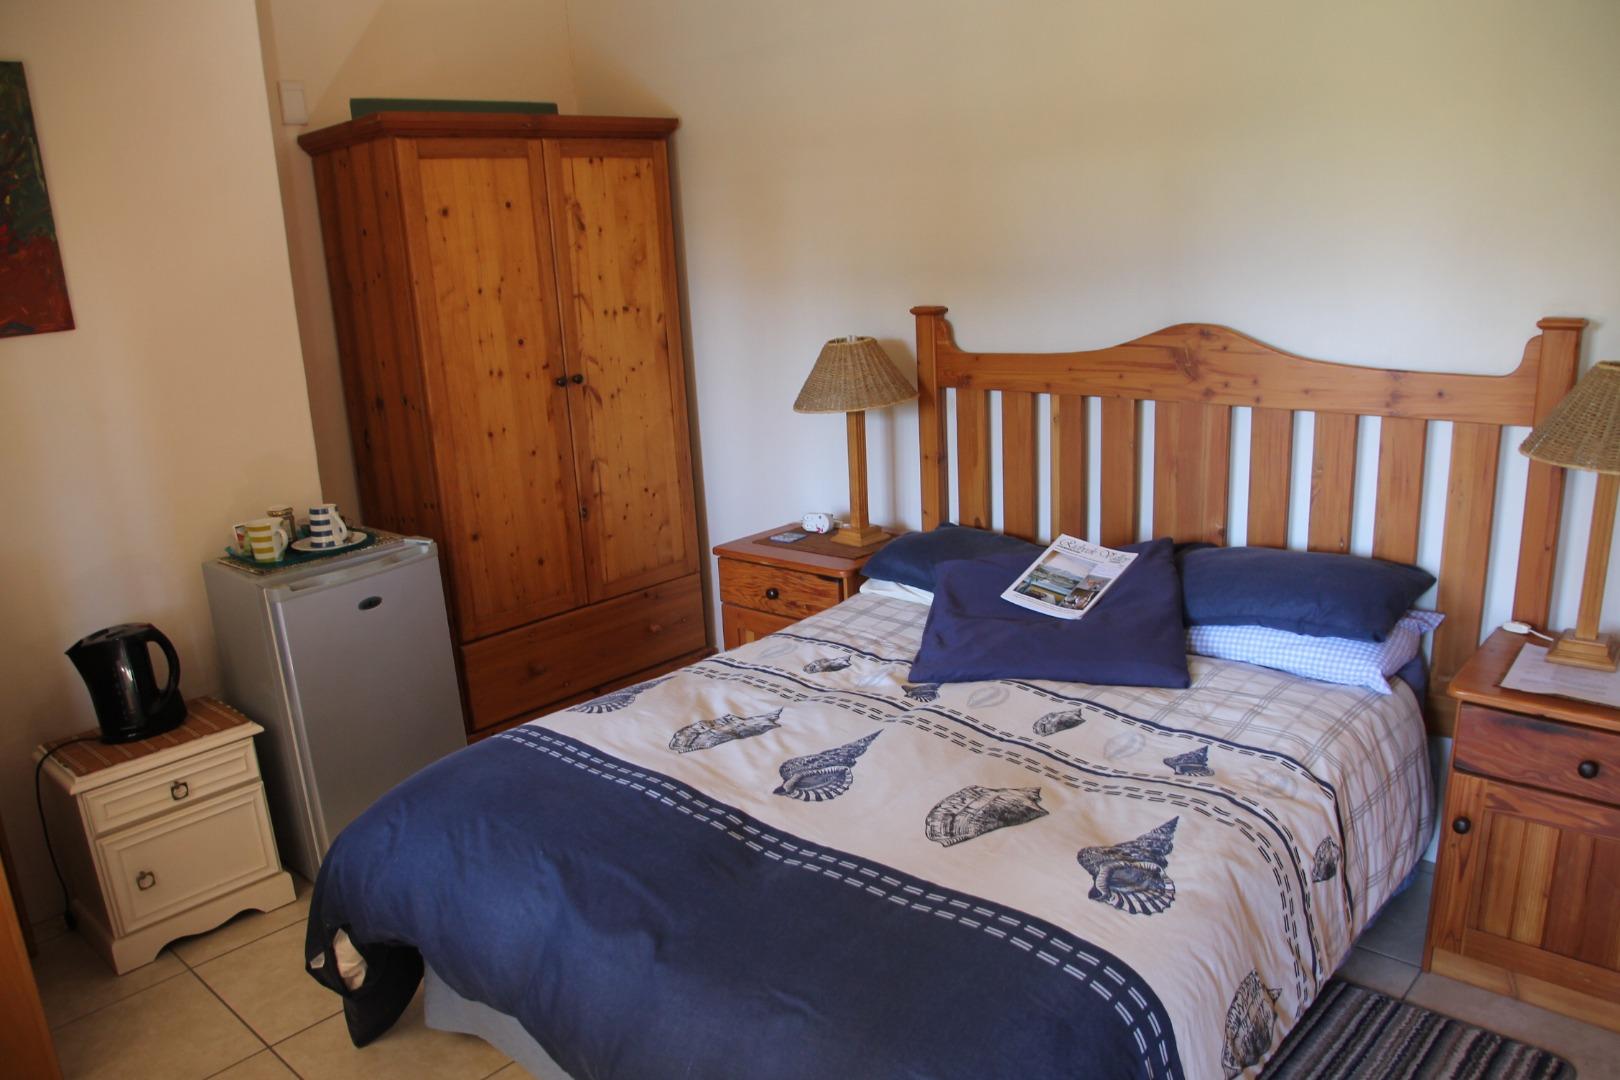 5 Bedroom House For Sale in Riebeek West